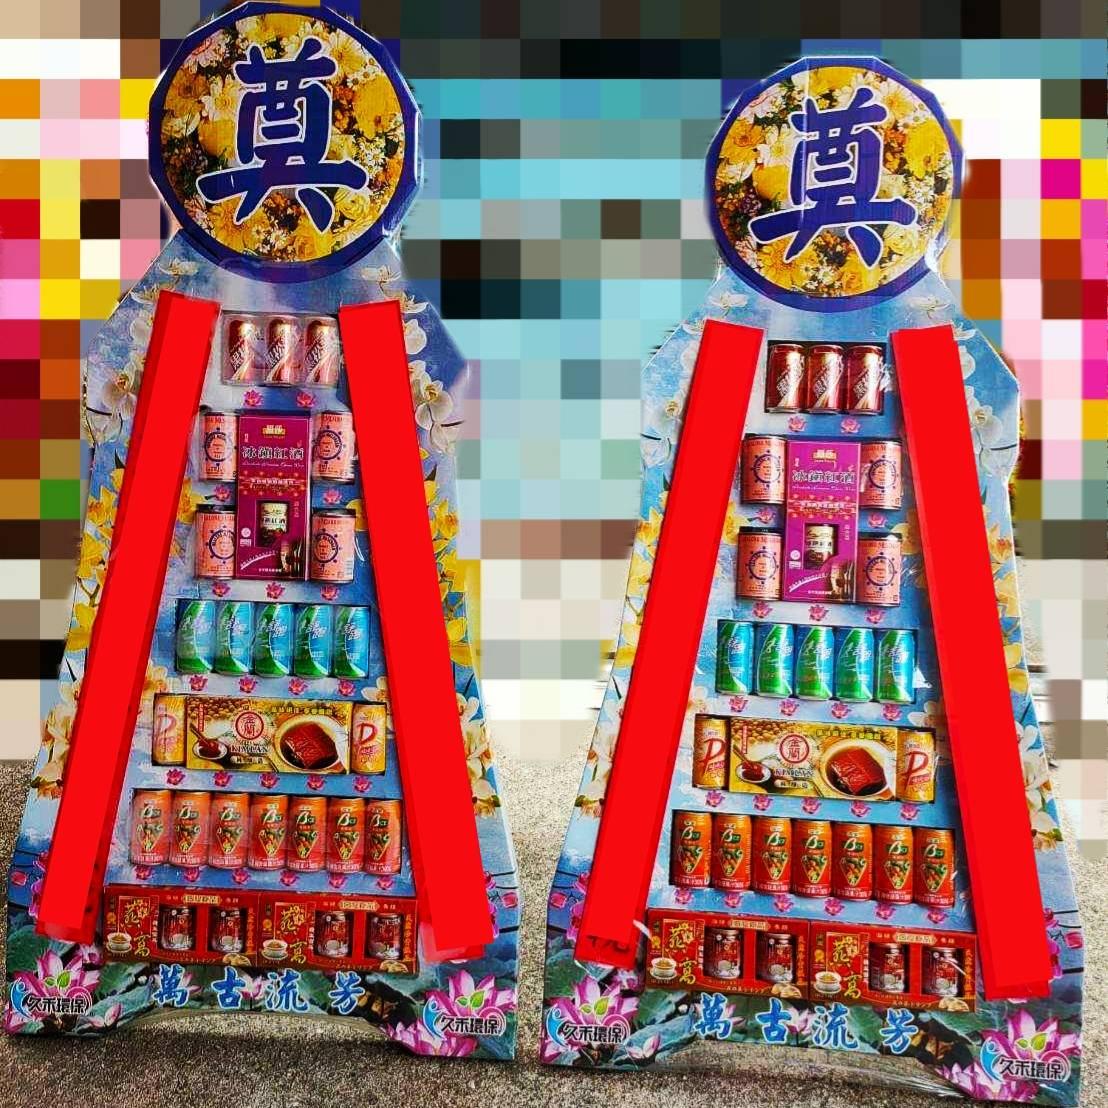 七層飲料食品罐頭塔